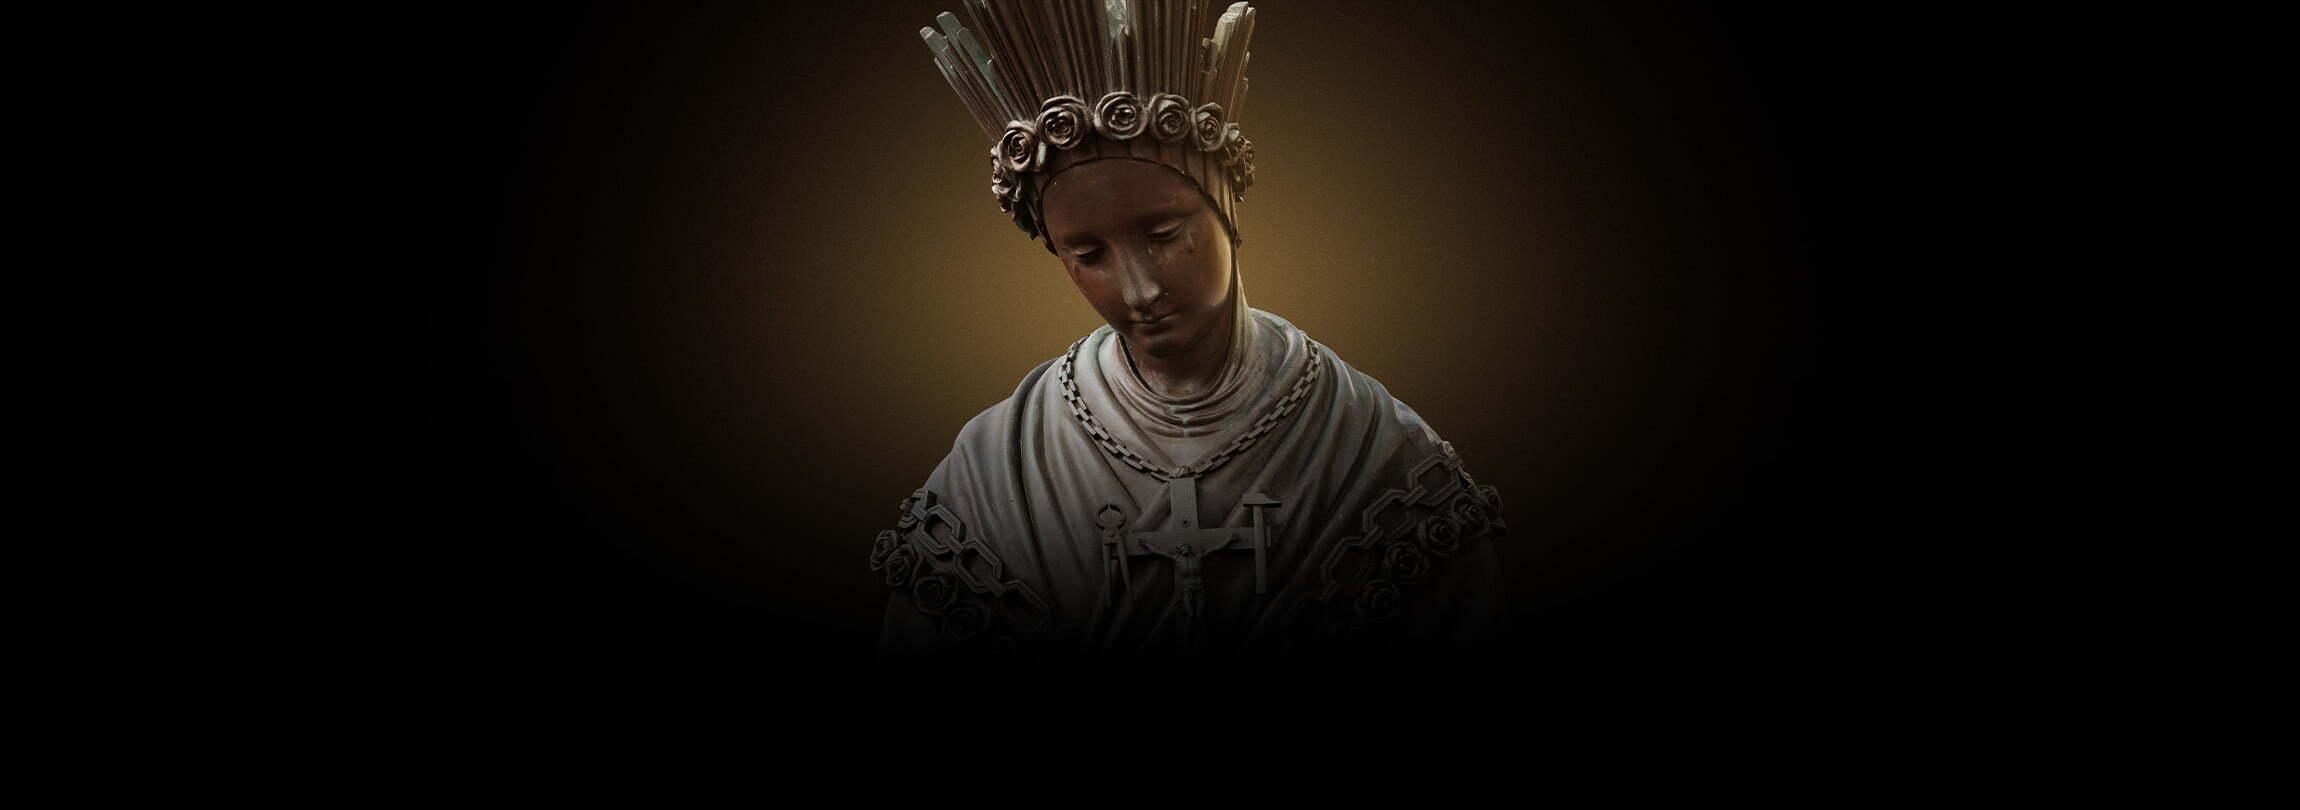 Os sacerdotes e o segredo de La Salette